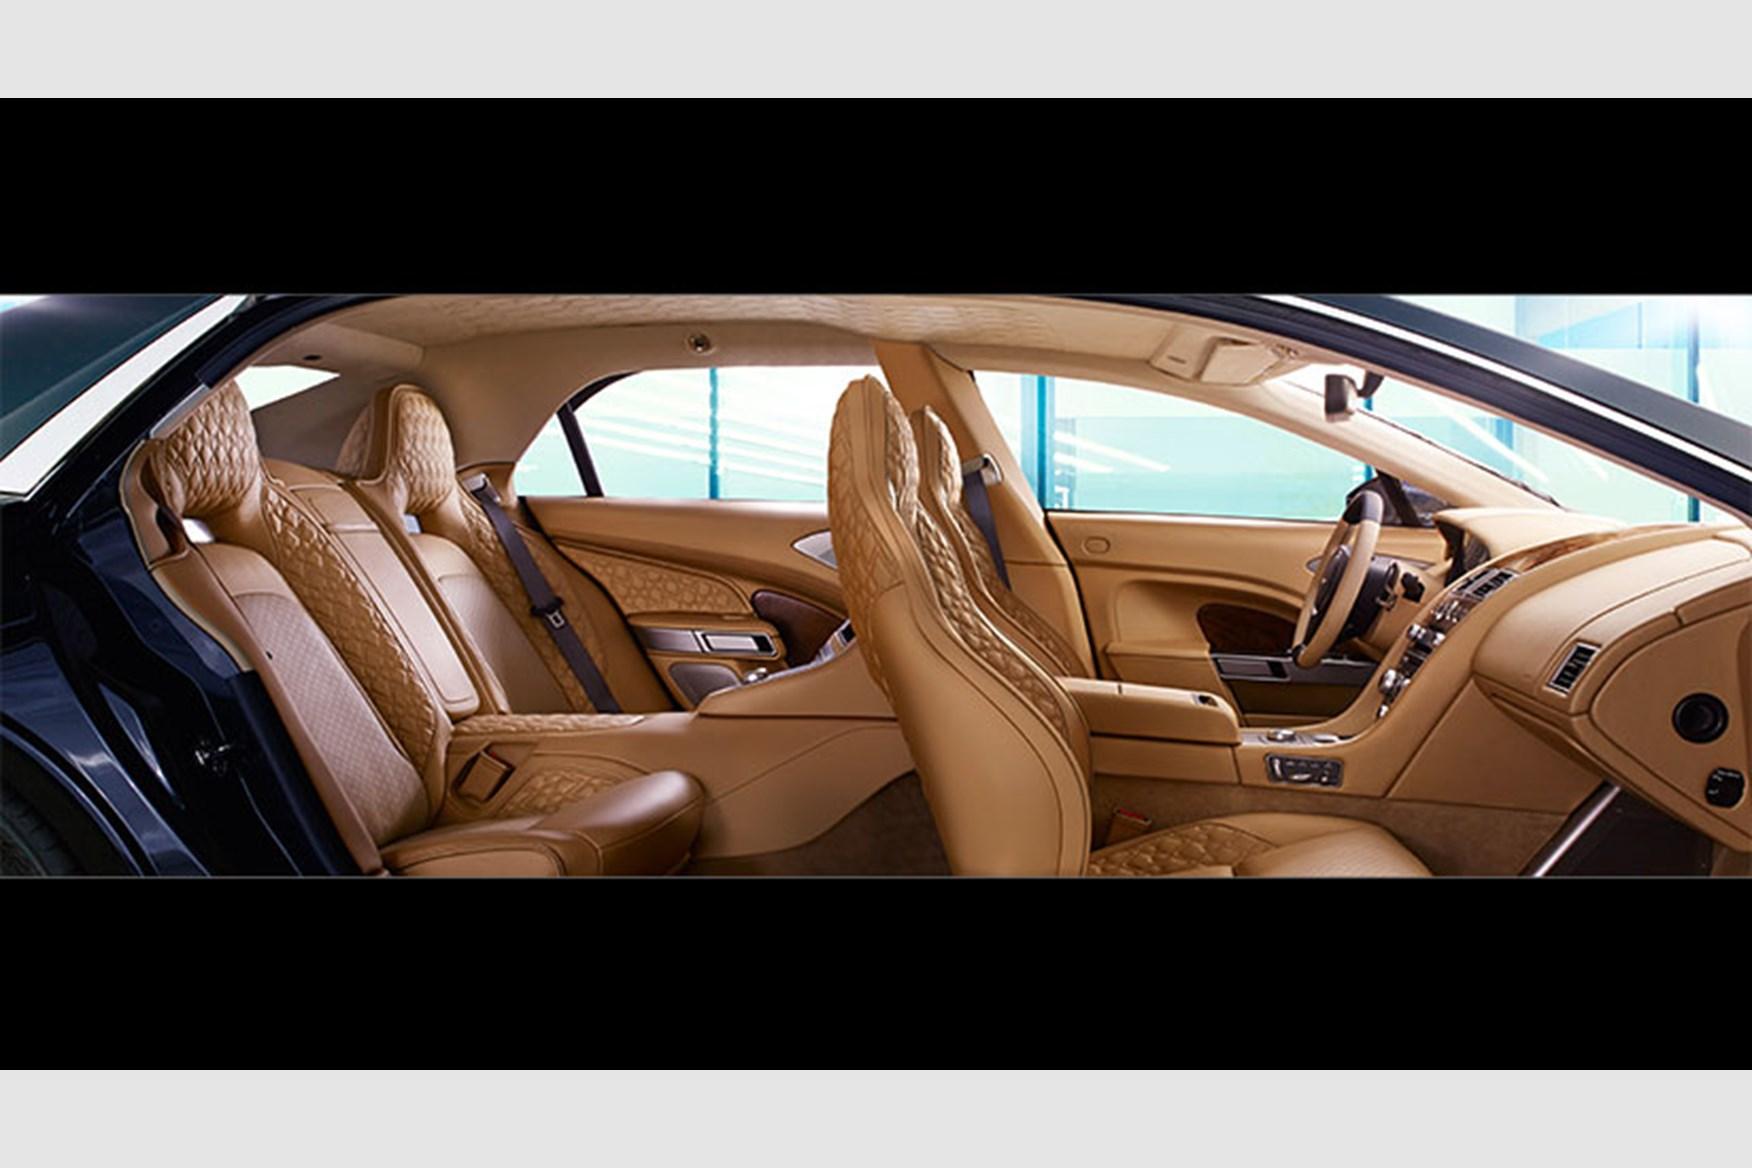 aston martin interior 2015. weu0027ll have to take the doors off full lenth view of new lagonda interior aston martin 2015 t